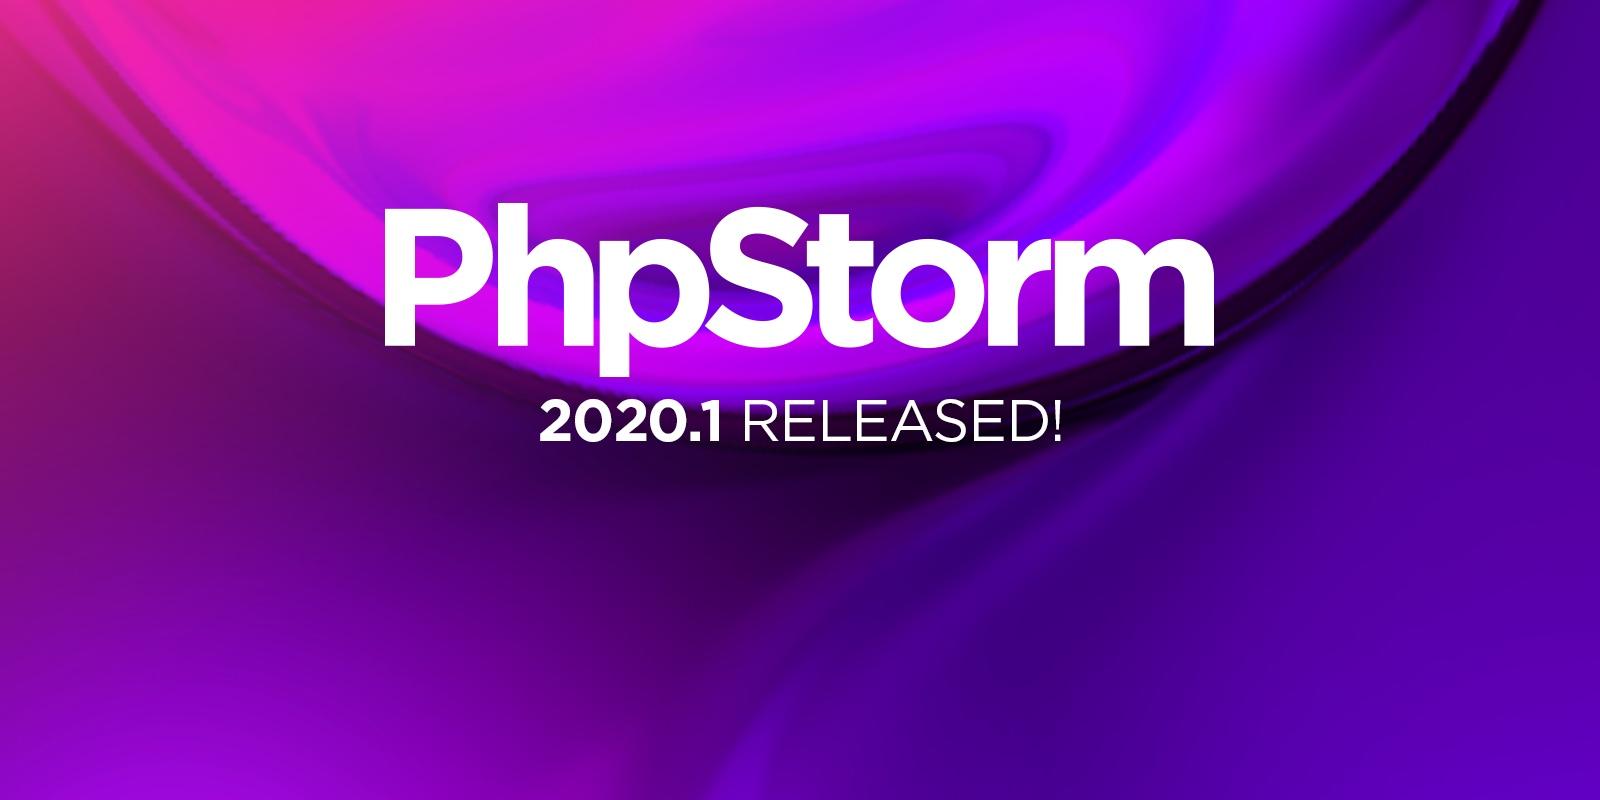 PhpStorm 2020.1